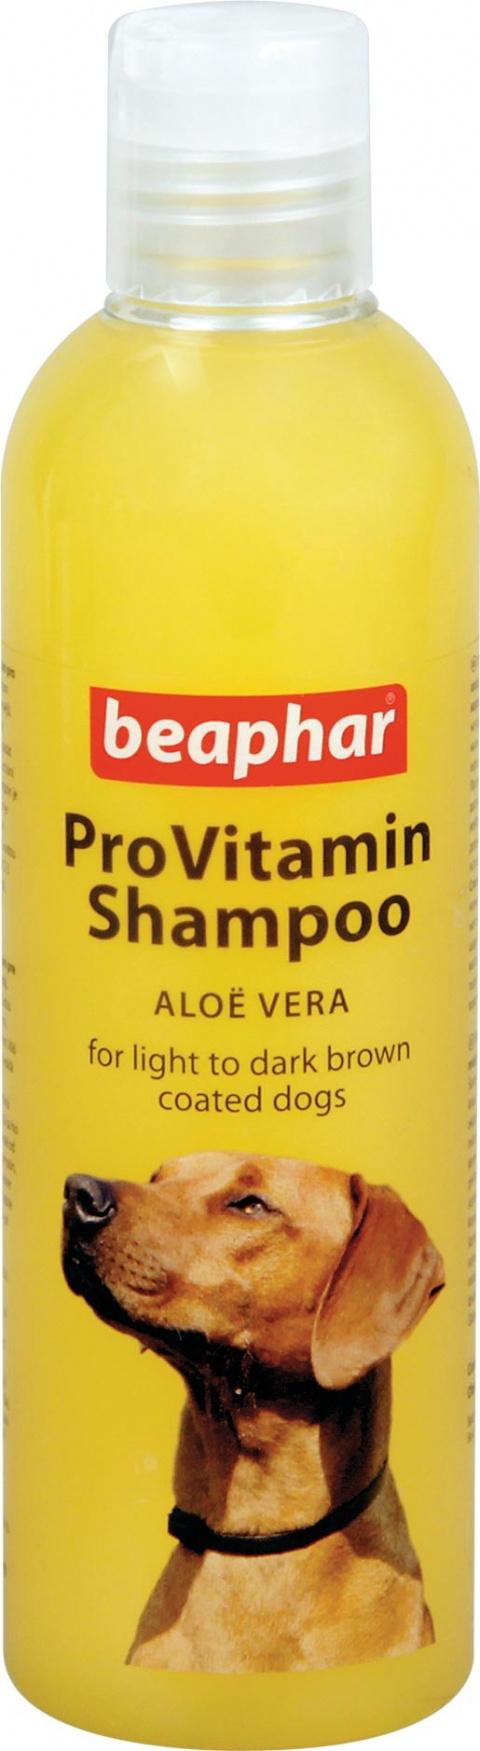 Шампунь для собак - Beaphar ProVitamin Shampoo Gold, 250 мл title=